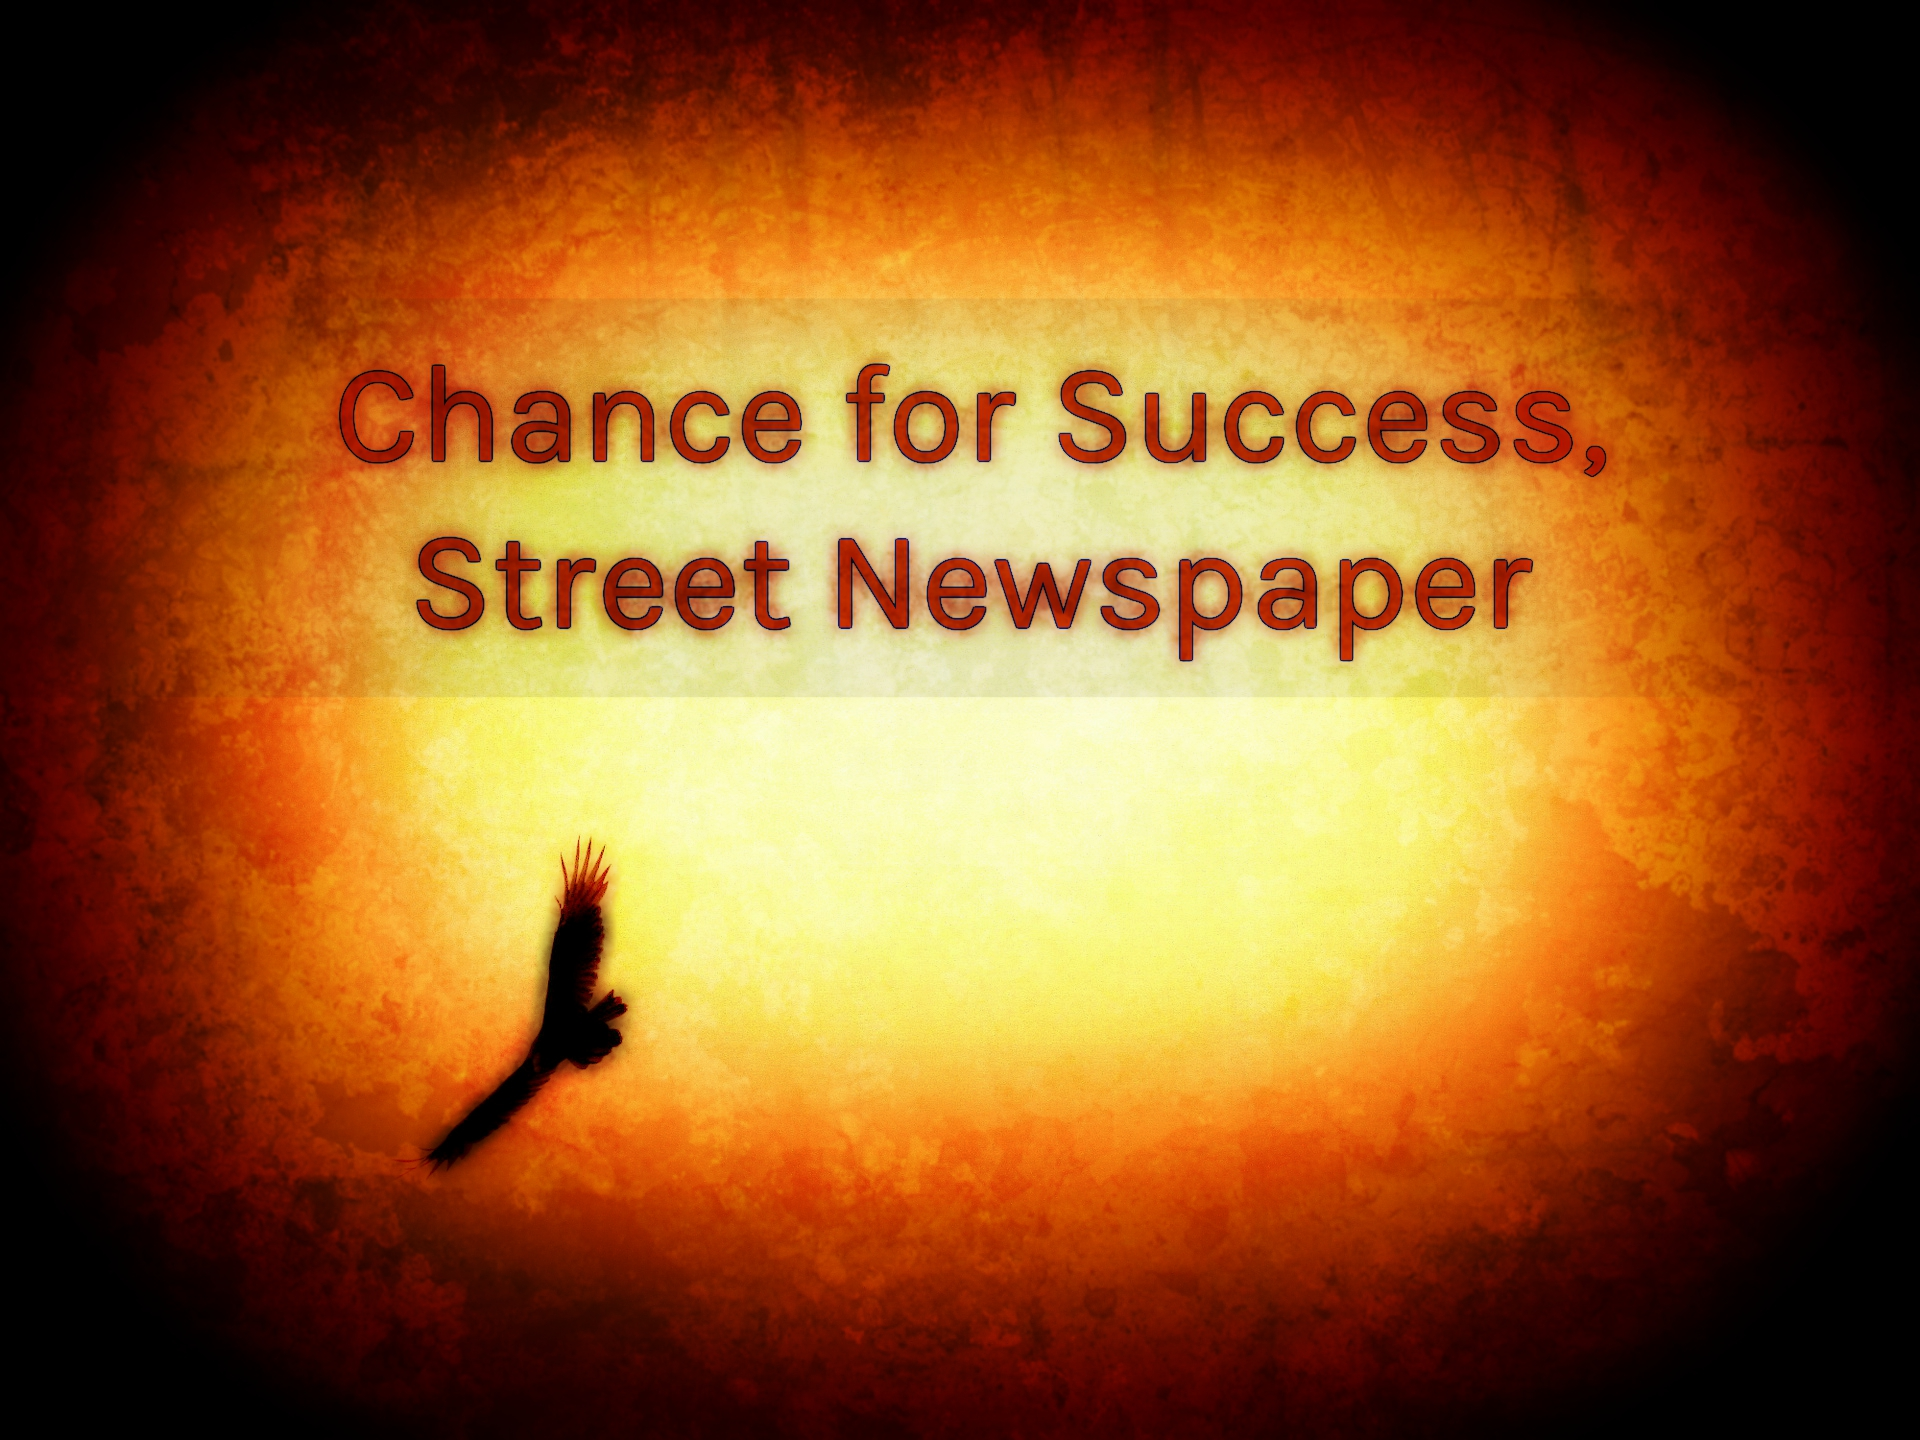 Chance for Success, Street Newspaper